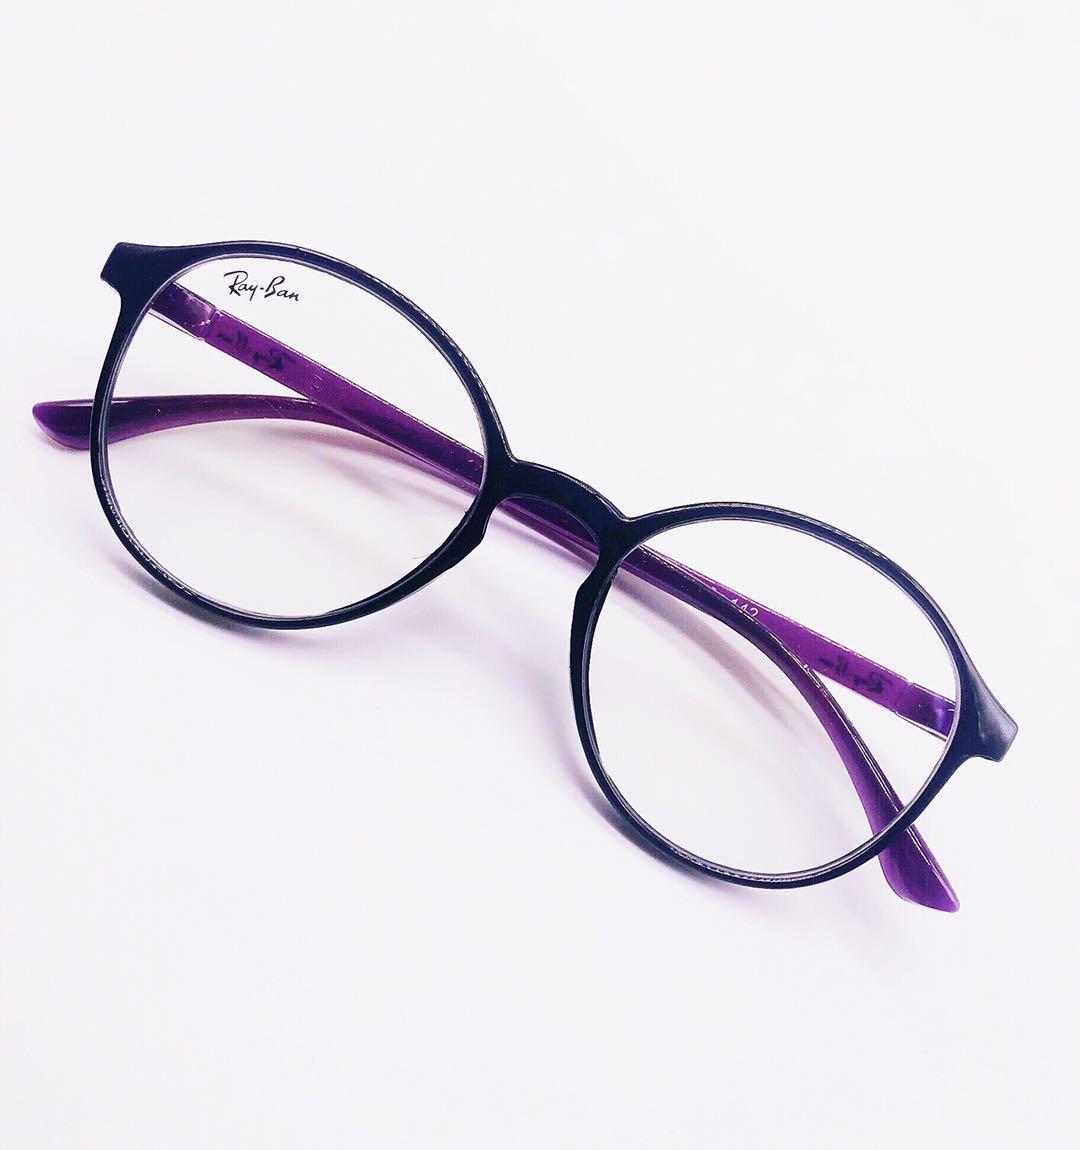 29363c1ca6 Sunglasses For Women for sale - Womens Sunglasses online brands ...